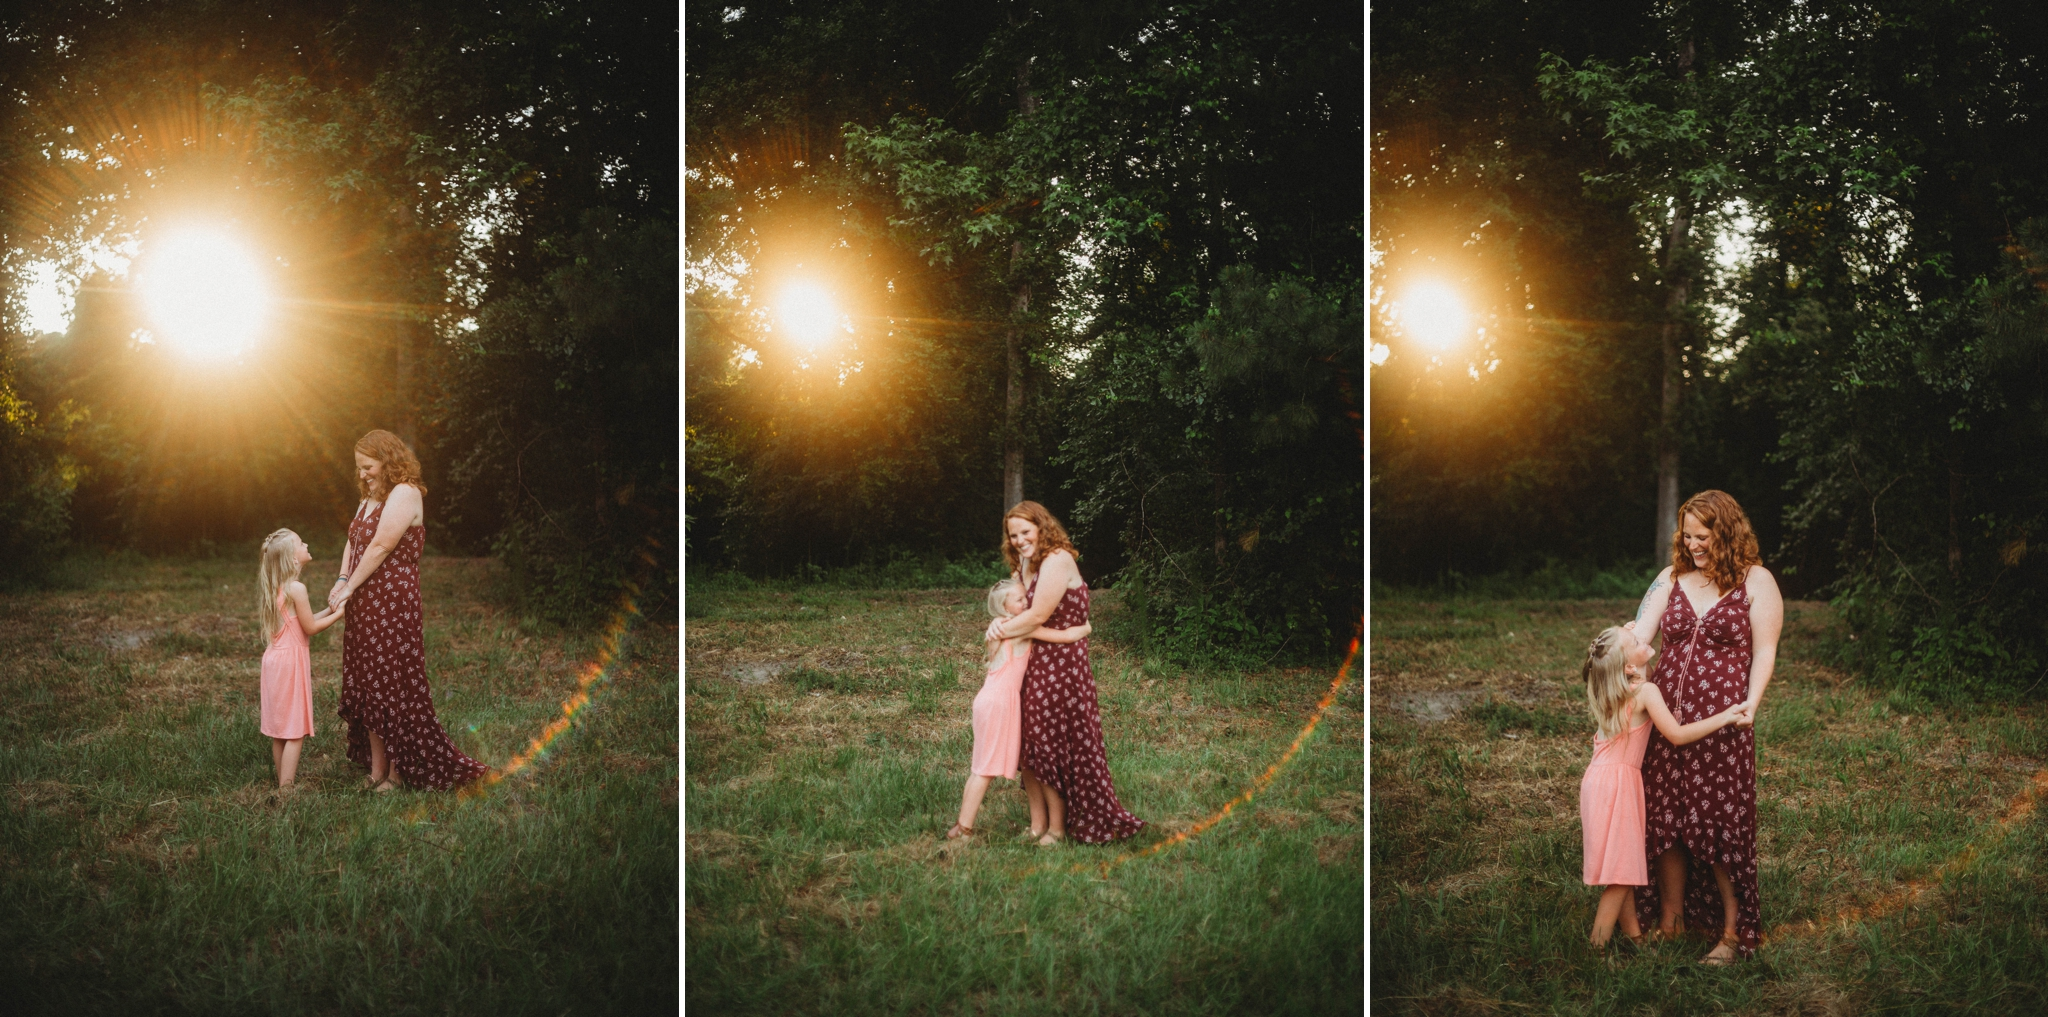 McNalls - Lifestyle Photography Session - Fayetteville Family North Carolina Photographer